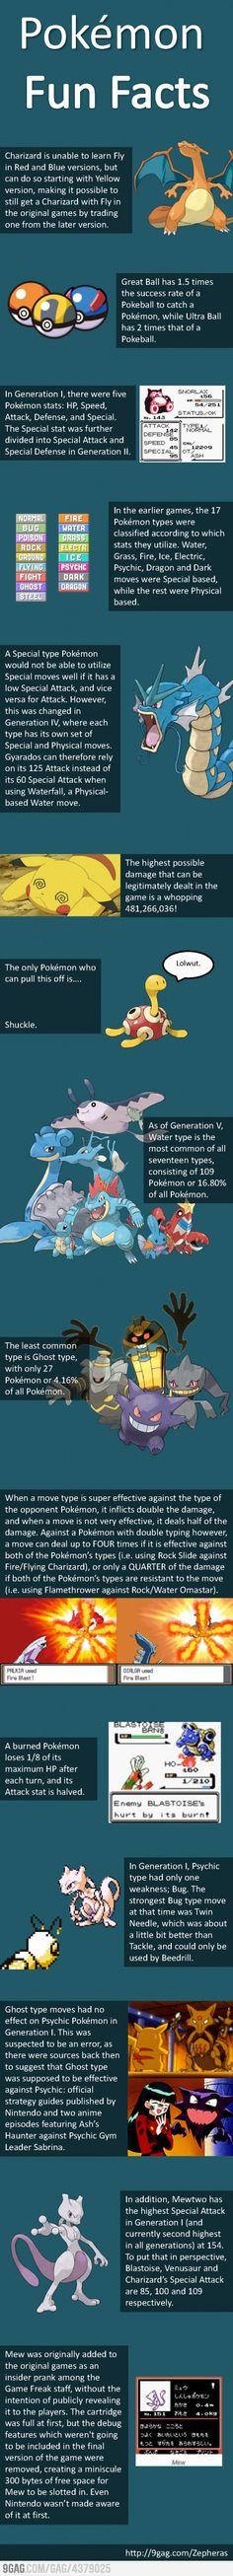 Pokemon Fun Facts